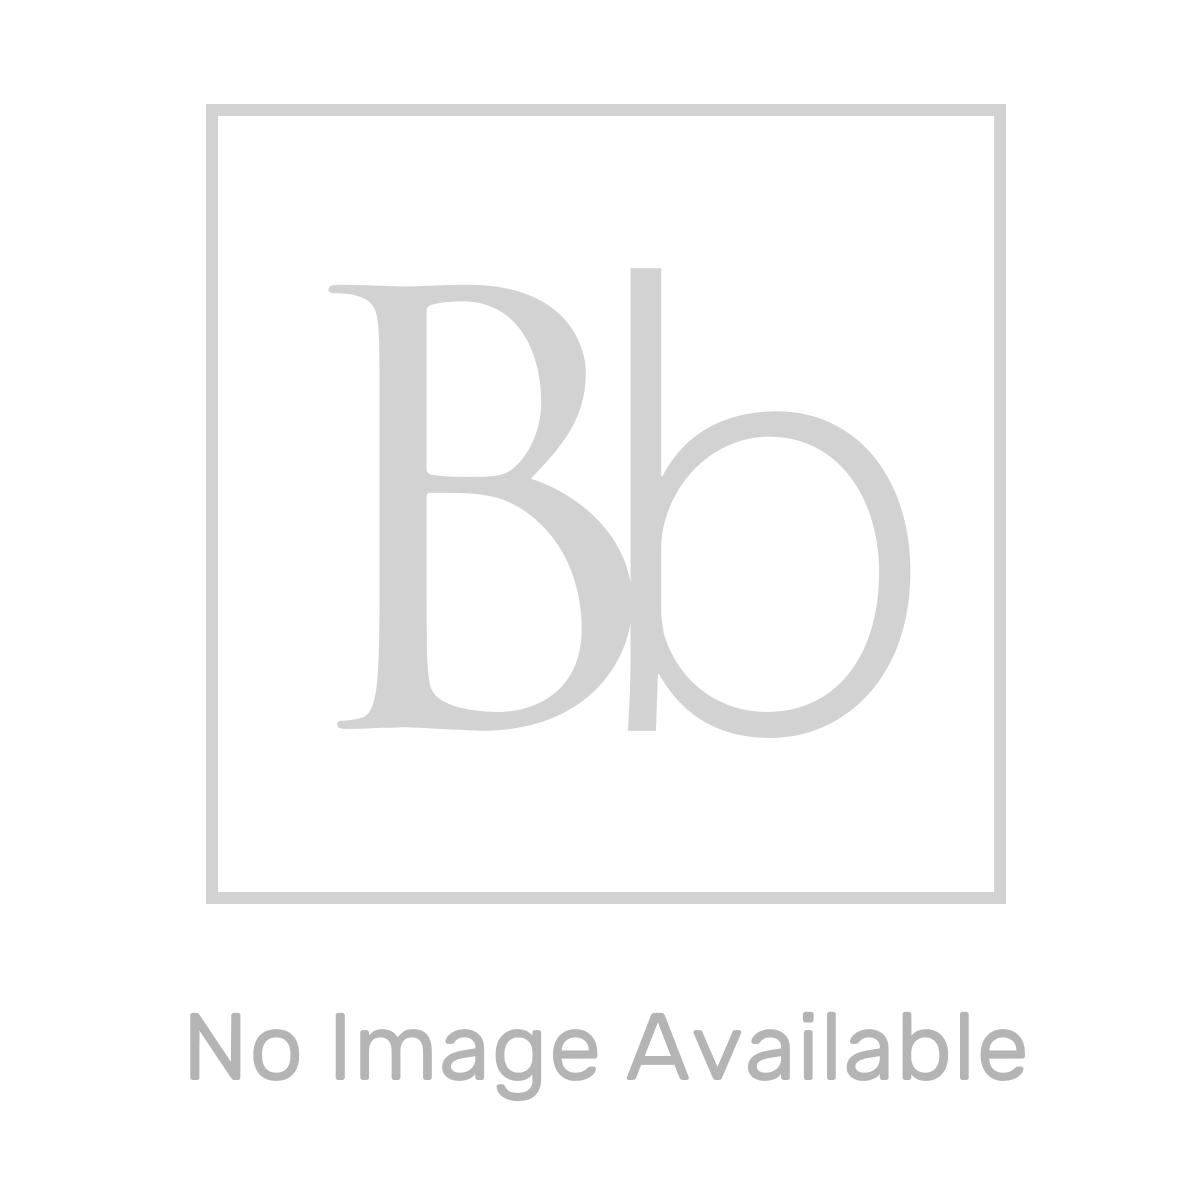 Kartell Encore White Wall WC Toilet Unit 600mm